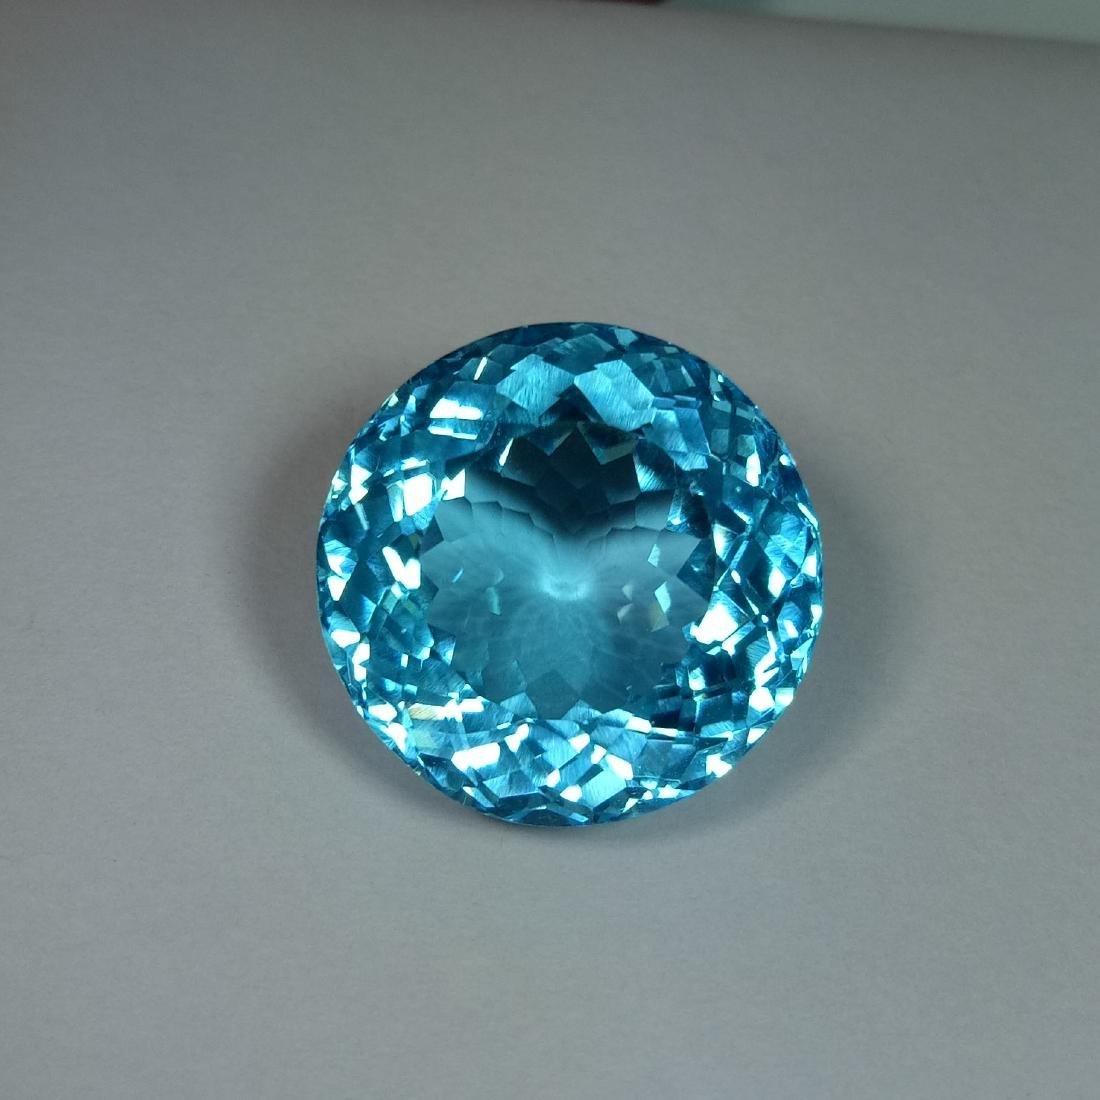 Swiss Blue Topaz - 35.30 ct - 2